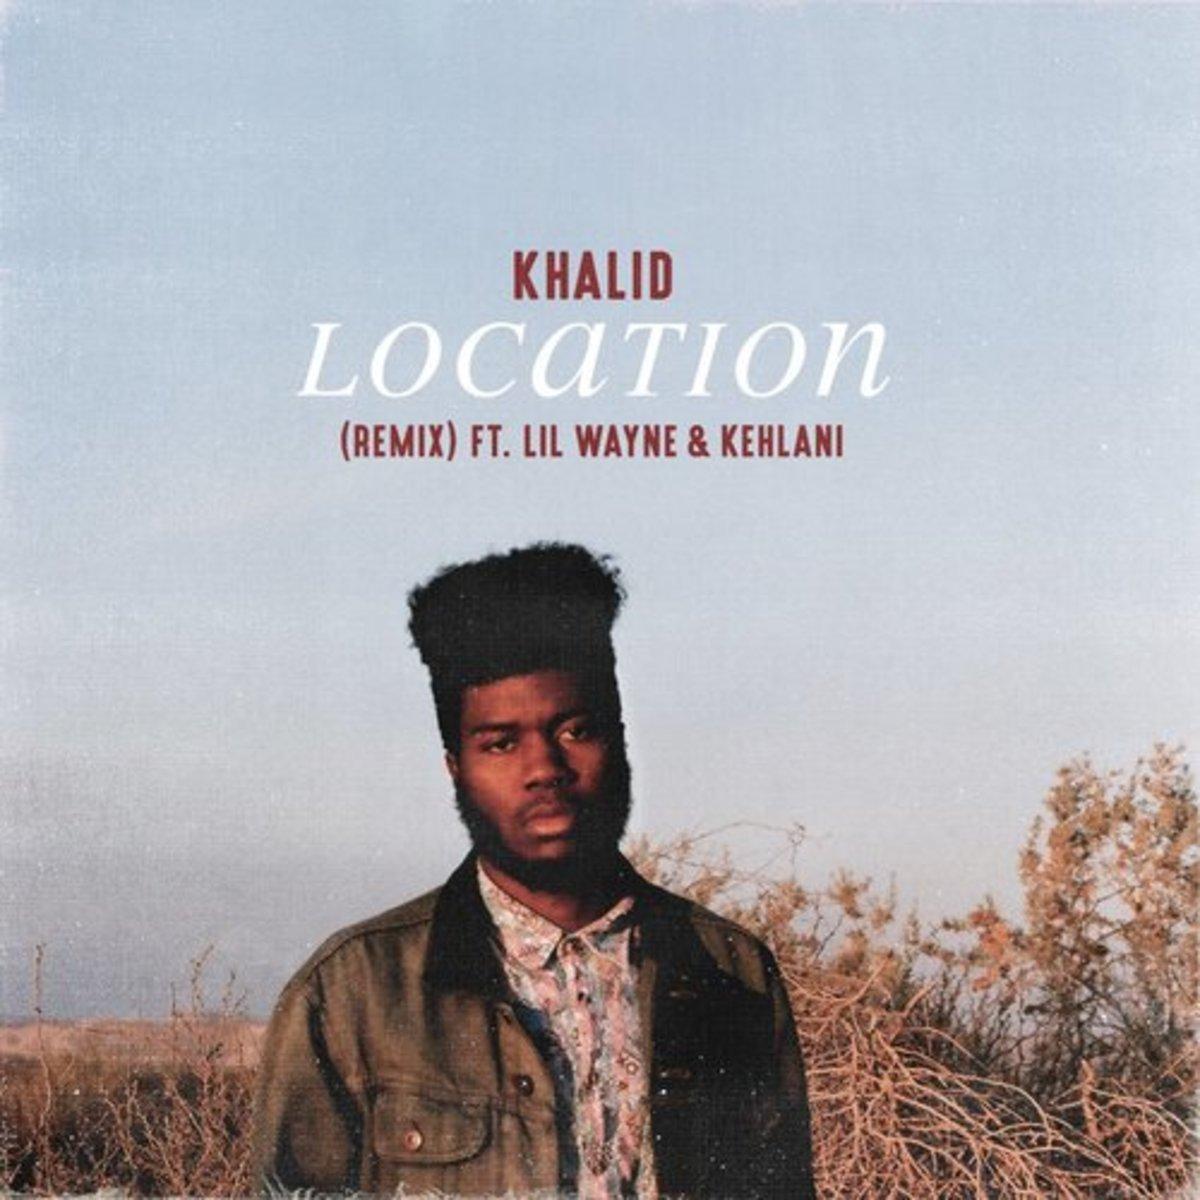 khalid-location-remix-2.jpg